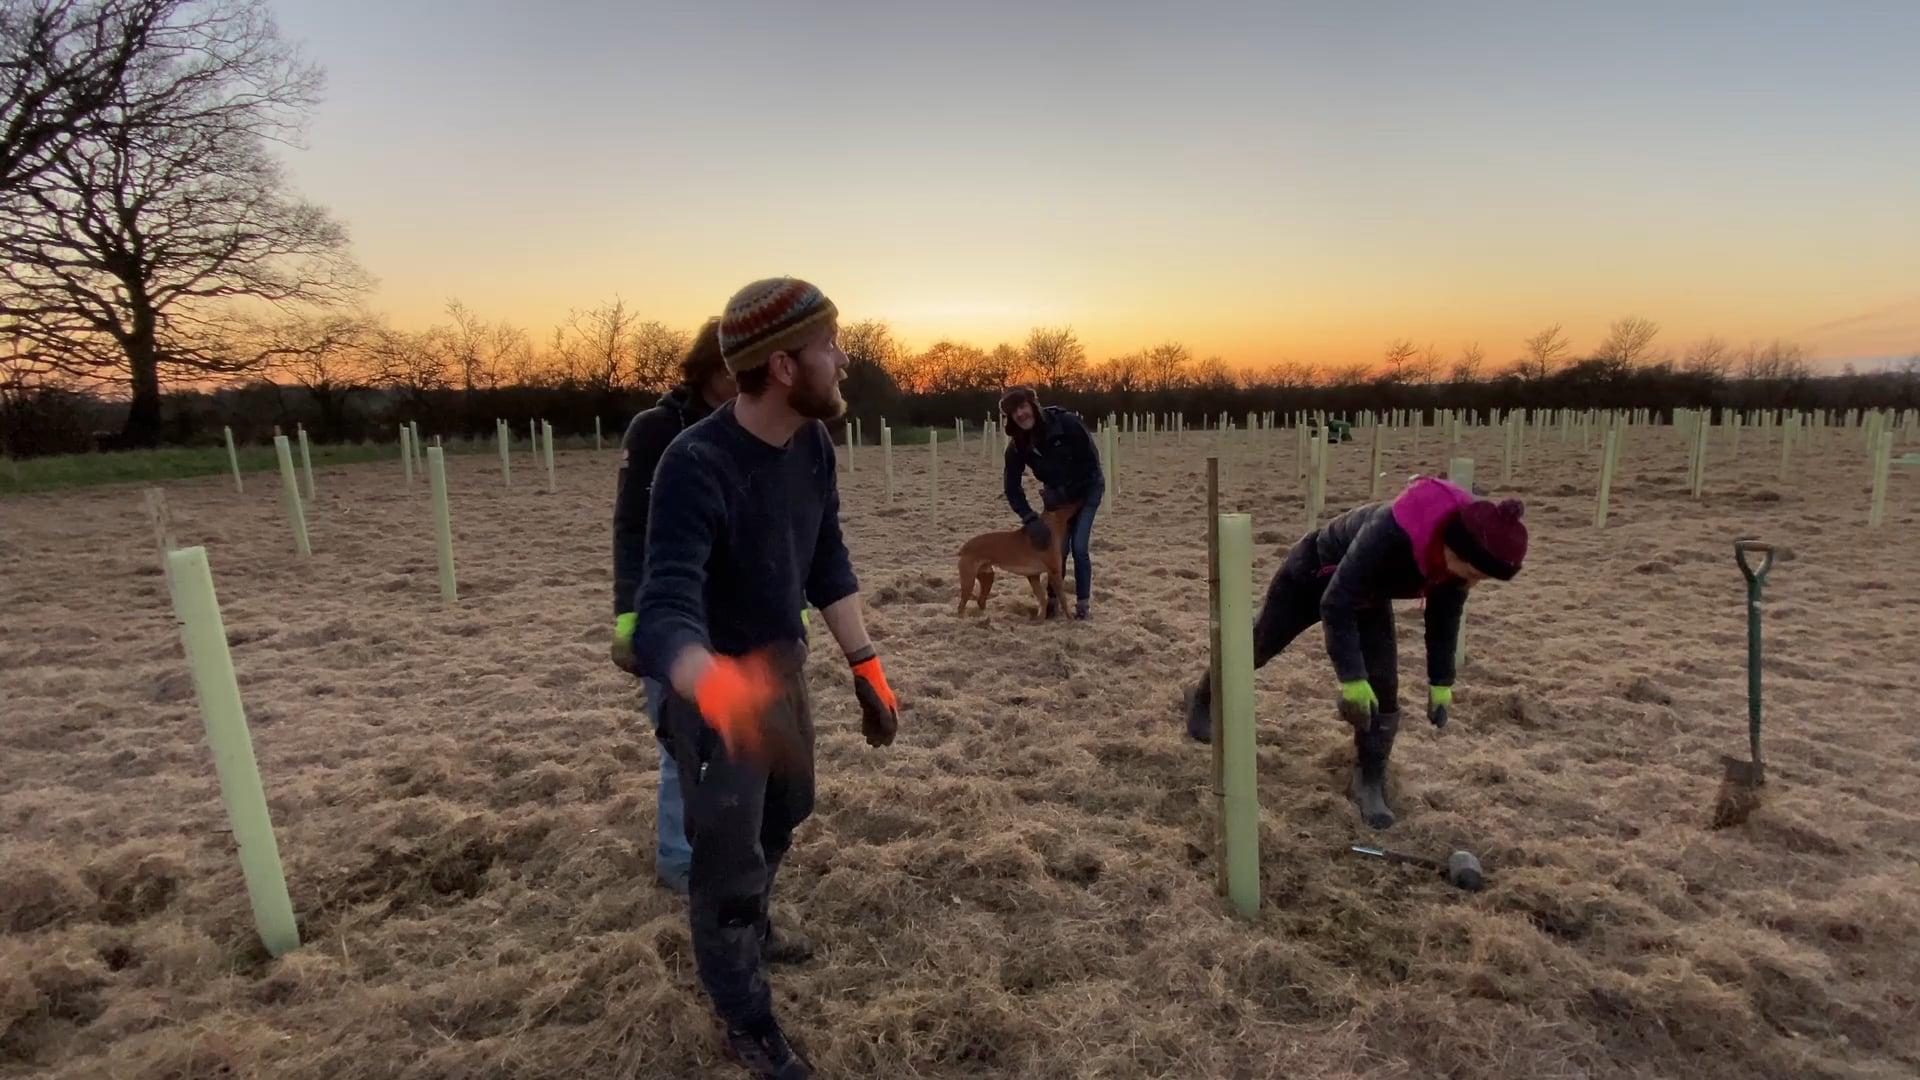 Ninebarrow Woodland Update - Saturday 6th March